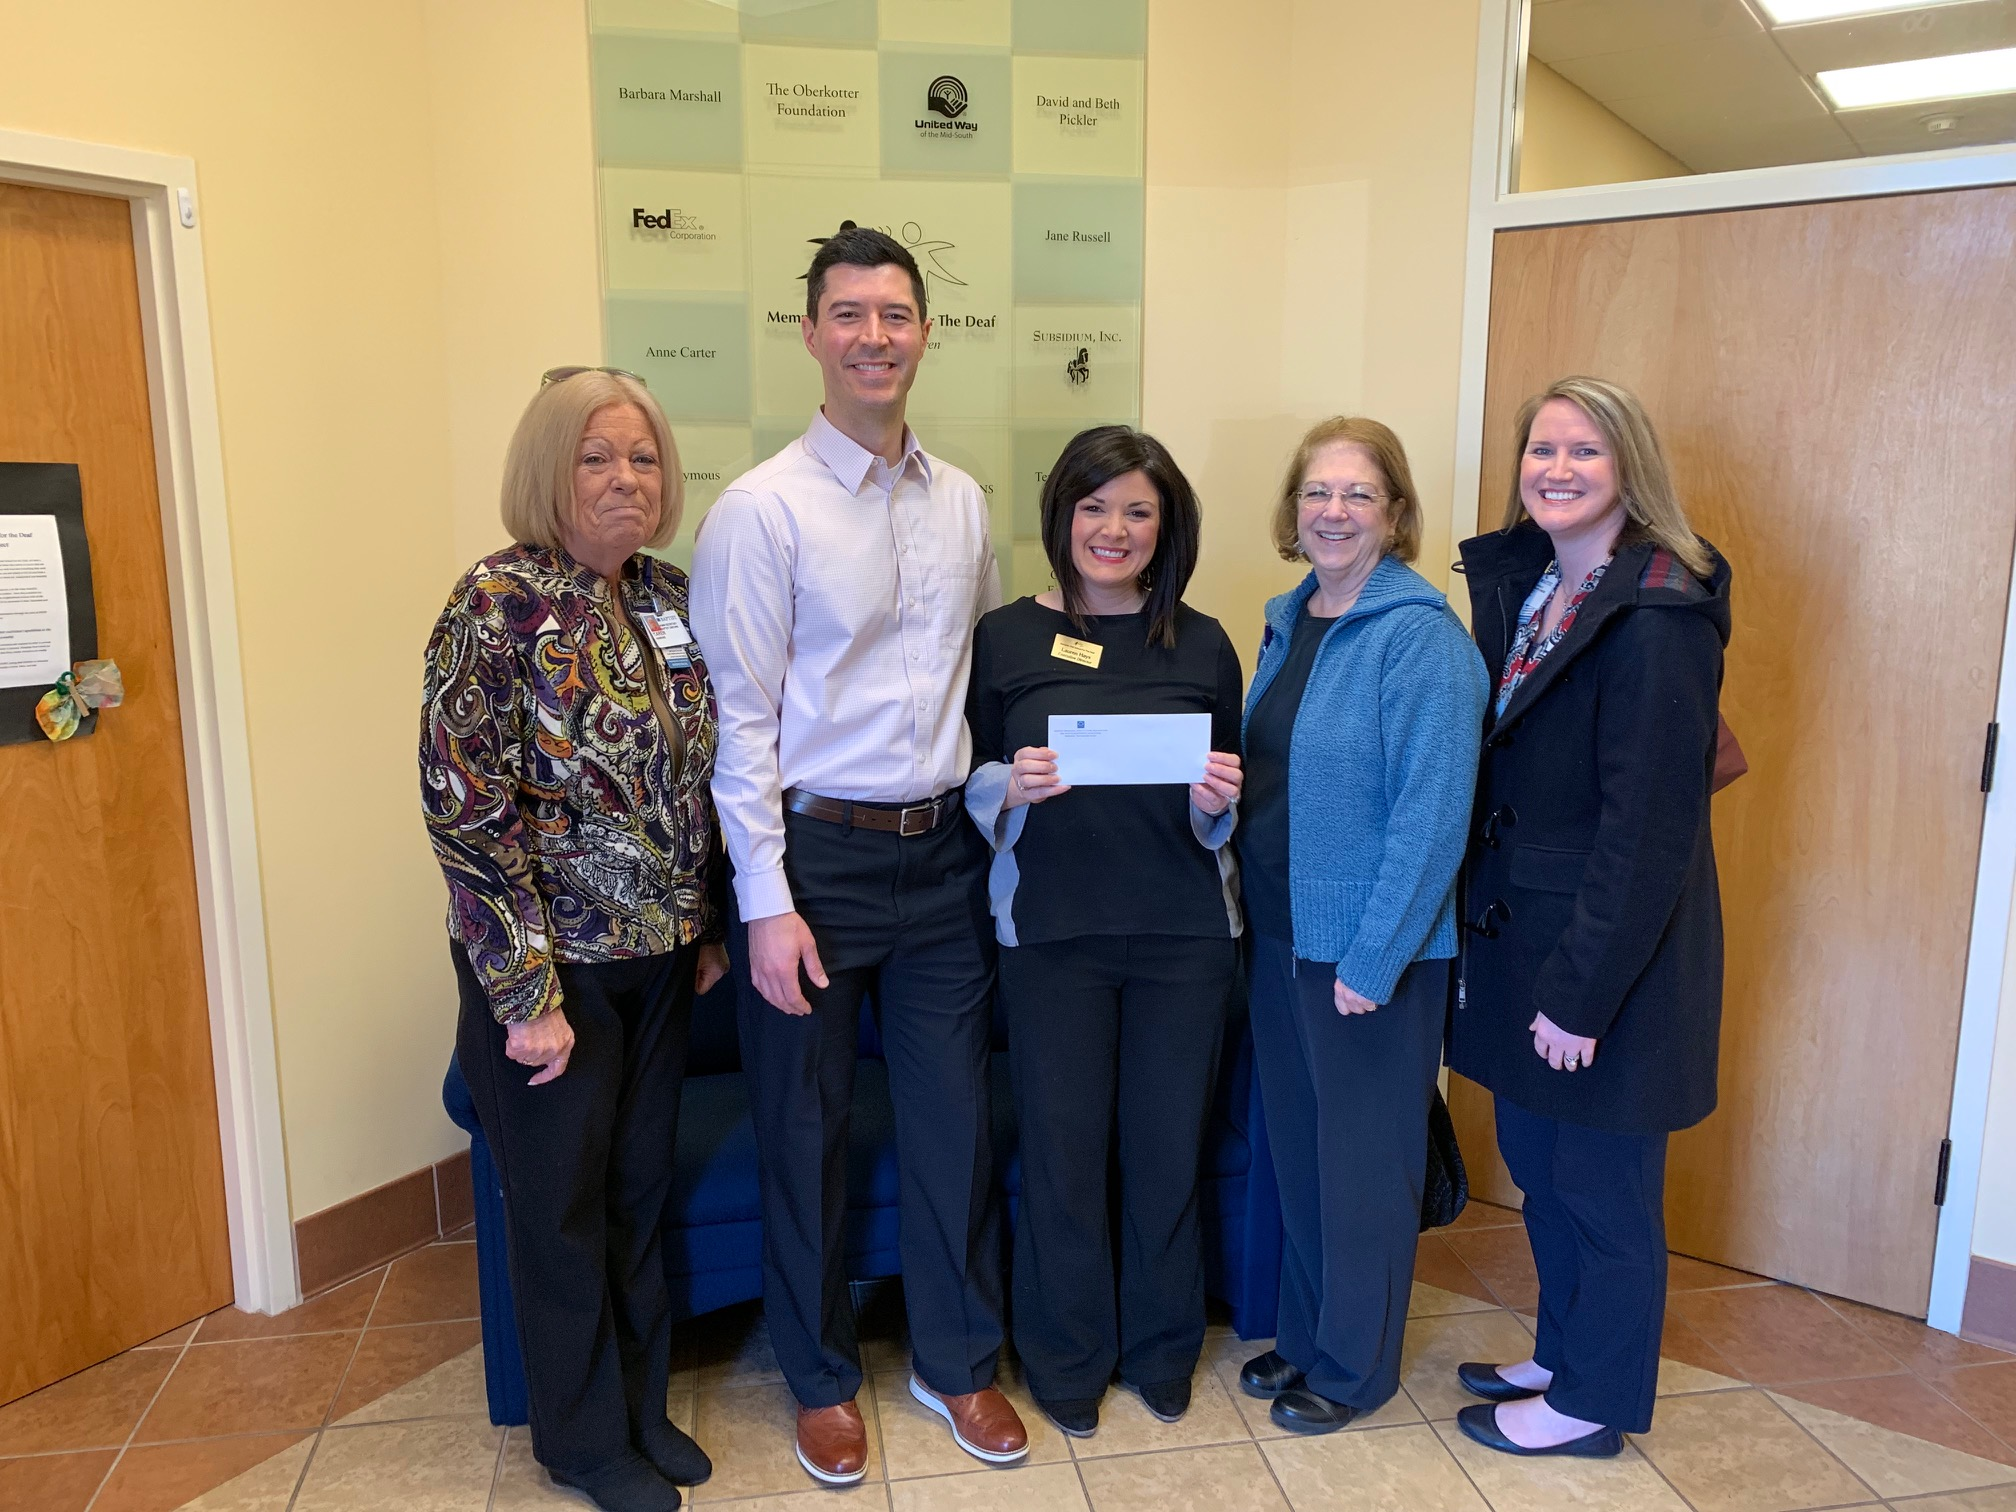 Baptist Memorial Health Care Donates $1,200 to MOSD!